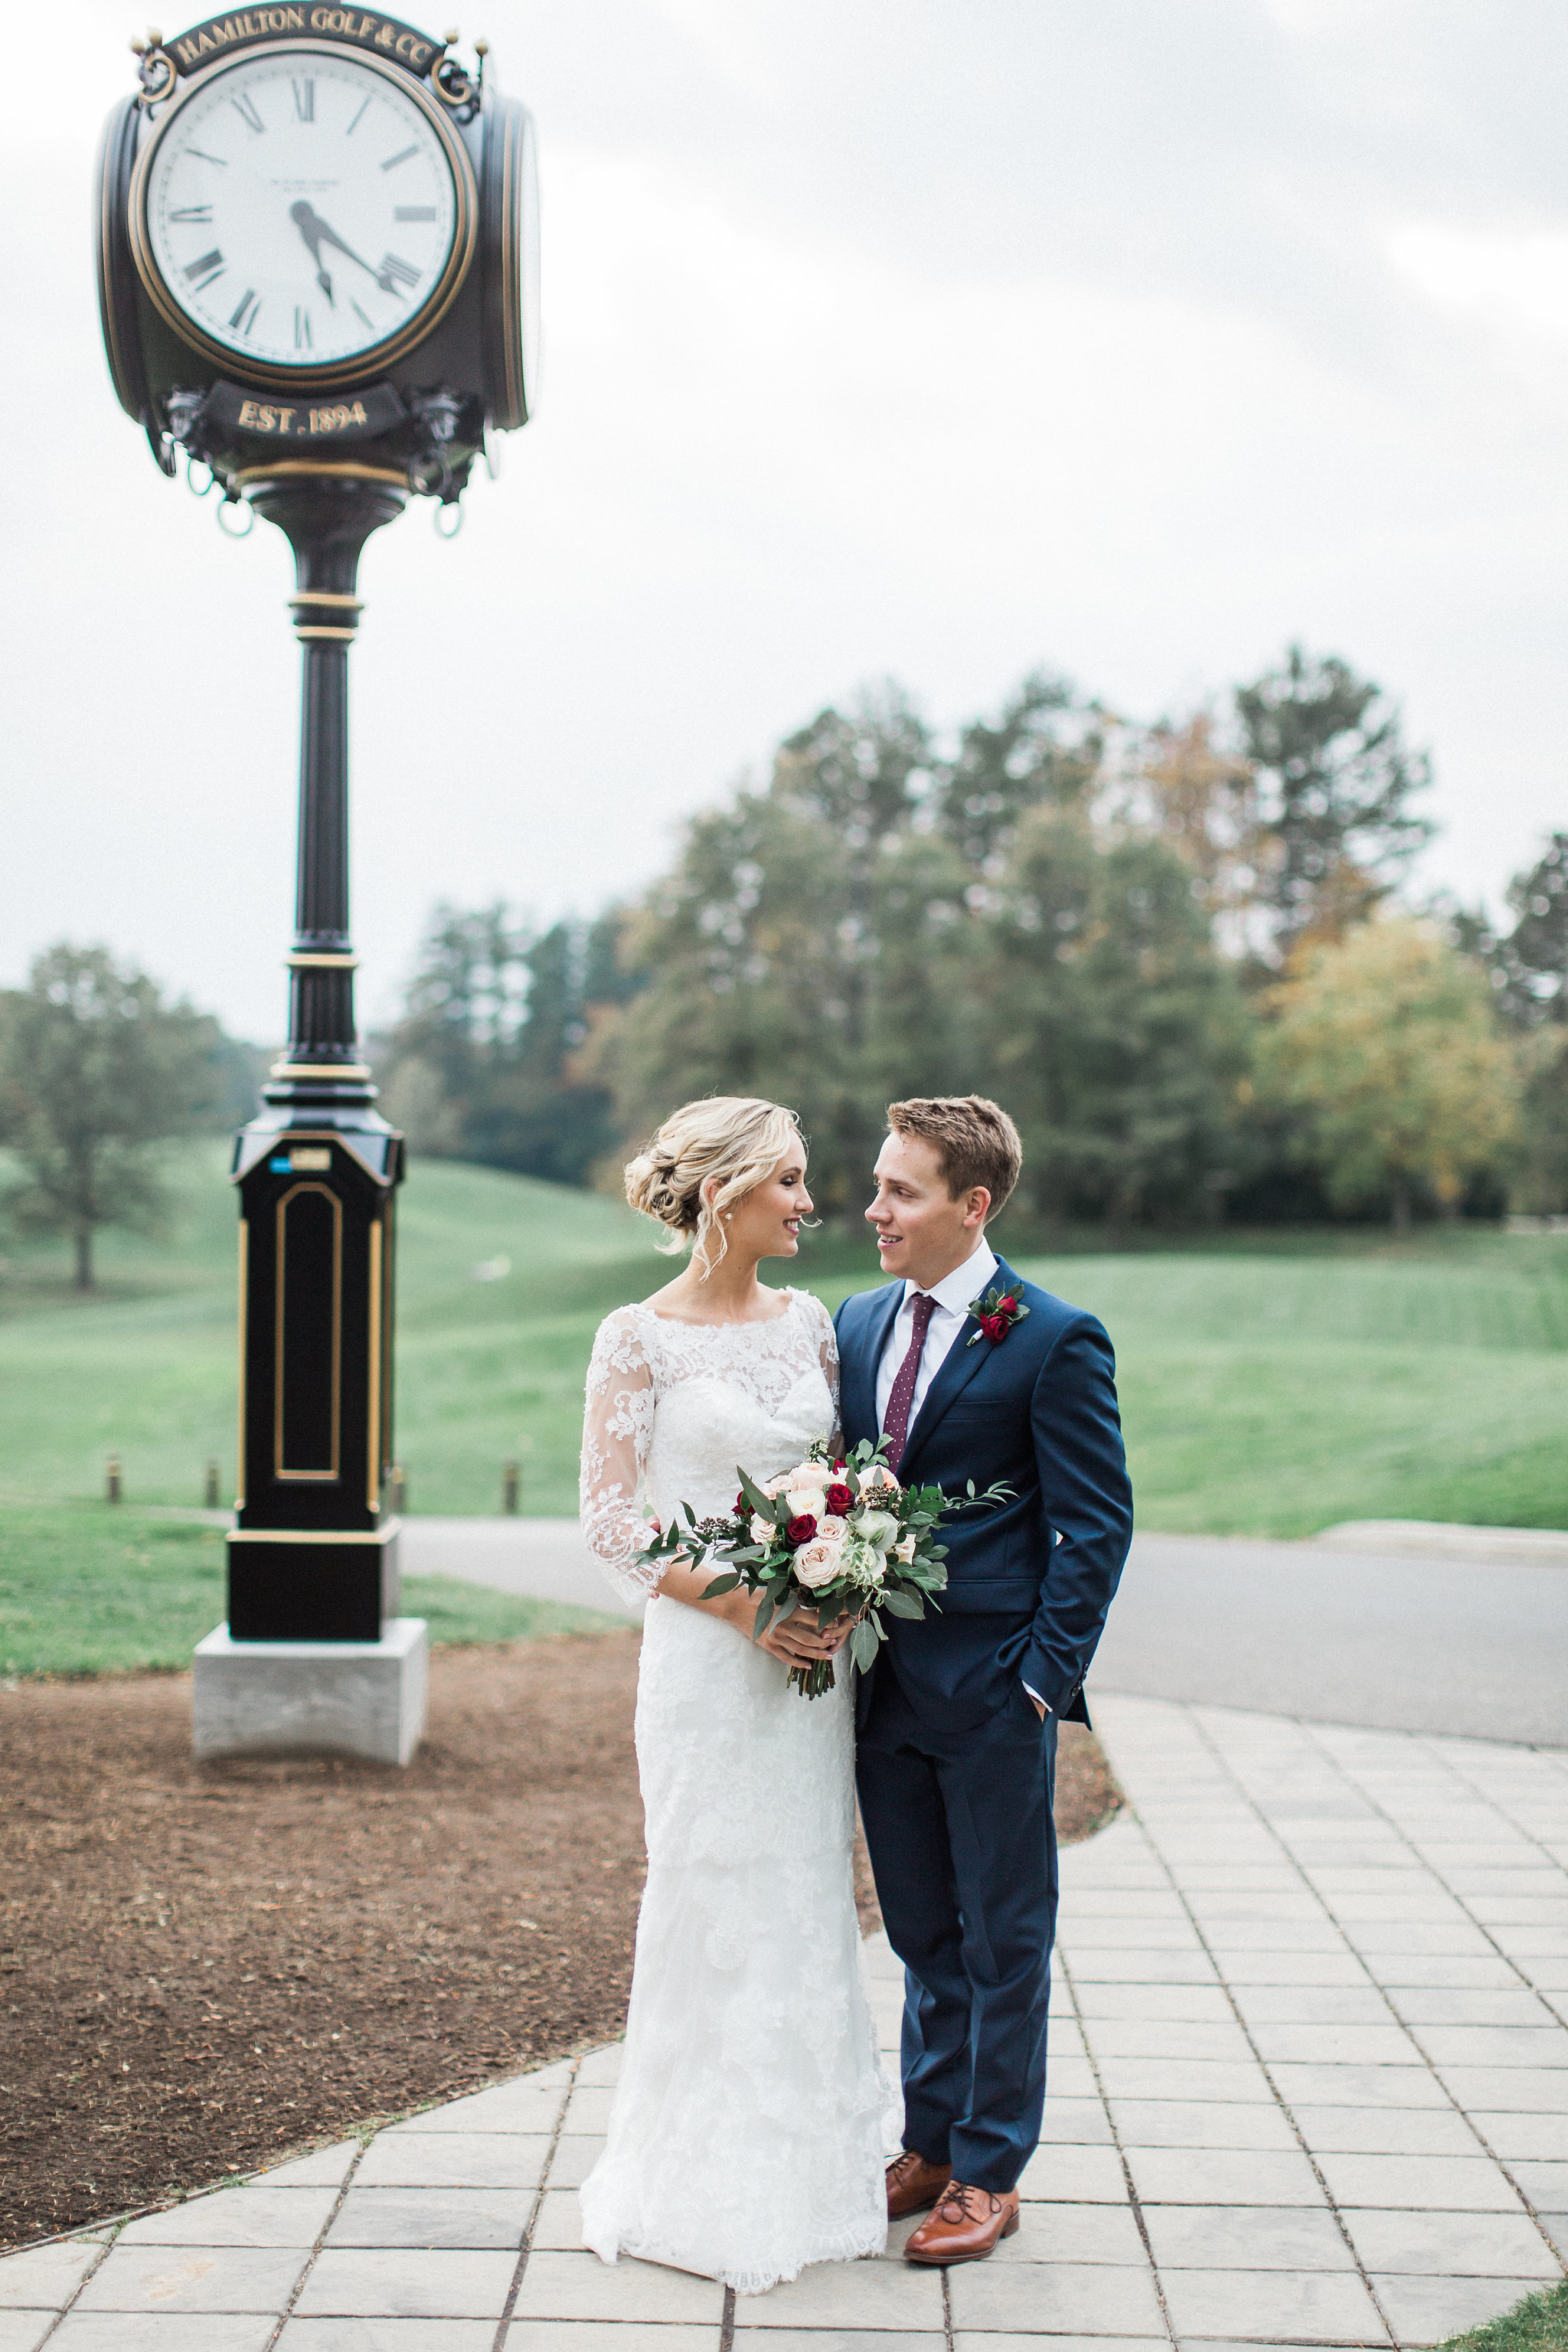 hamilton golf and country club wedding kj and co ksp-1010.jpg